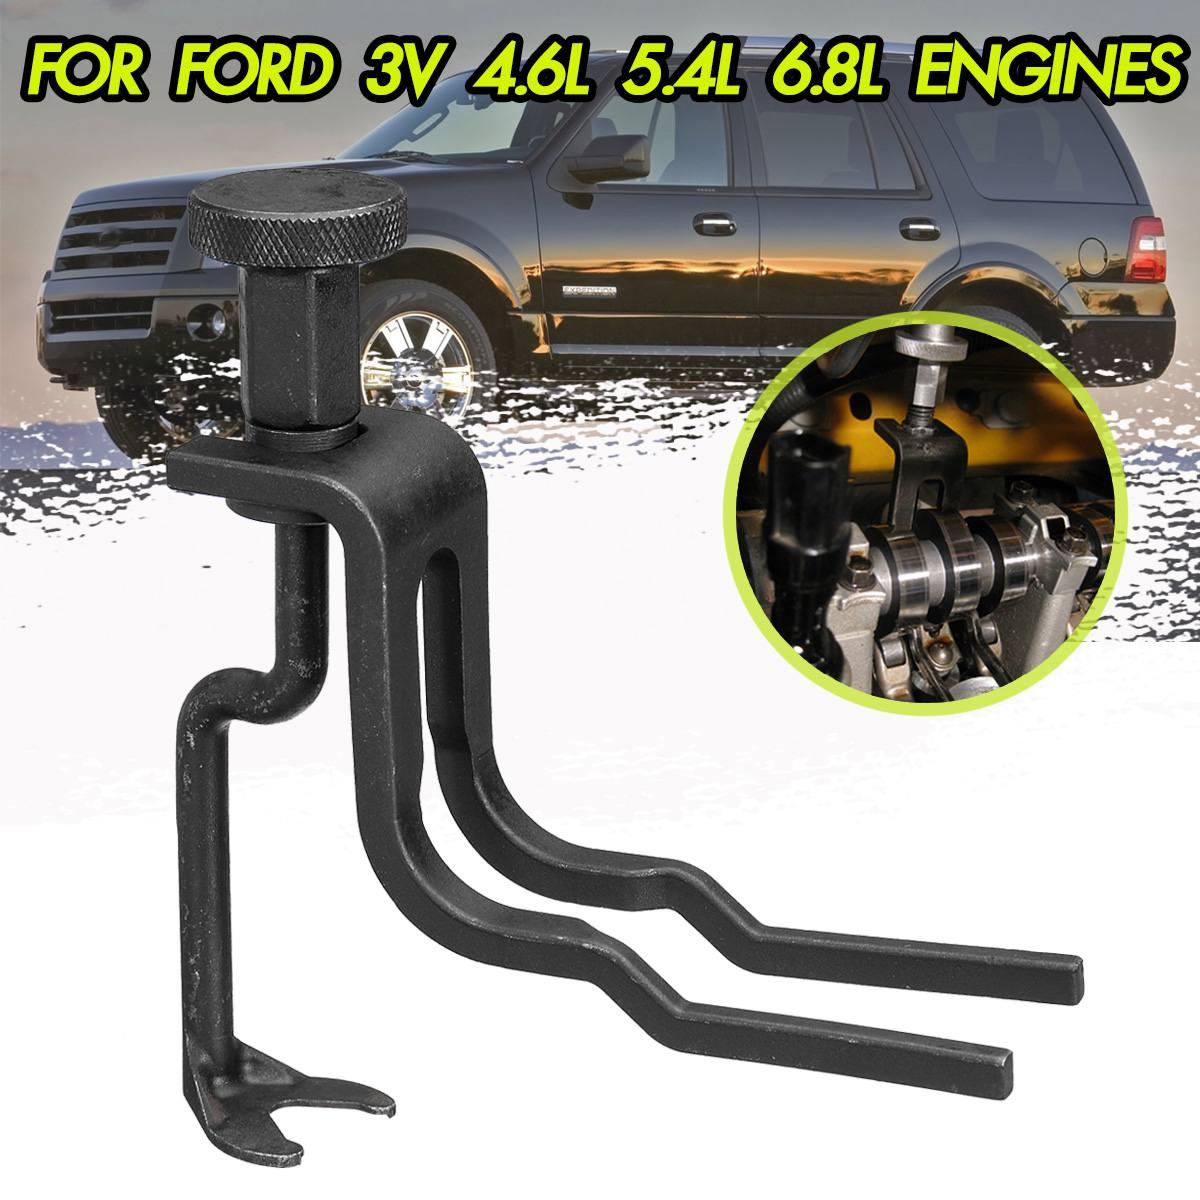 Car Valve Spring Compressor Tool For Ford/Mustang Expedition Explorer F-150 Super Duty Sport Trac 4.6 5.4 6.8 3V Engines